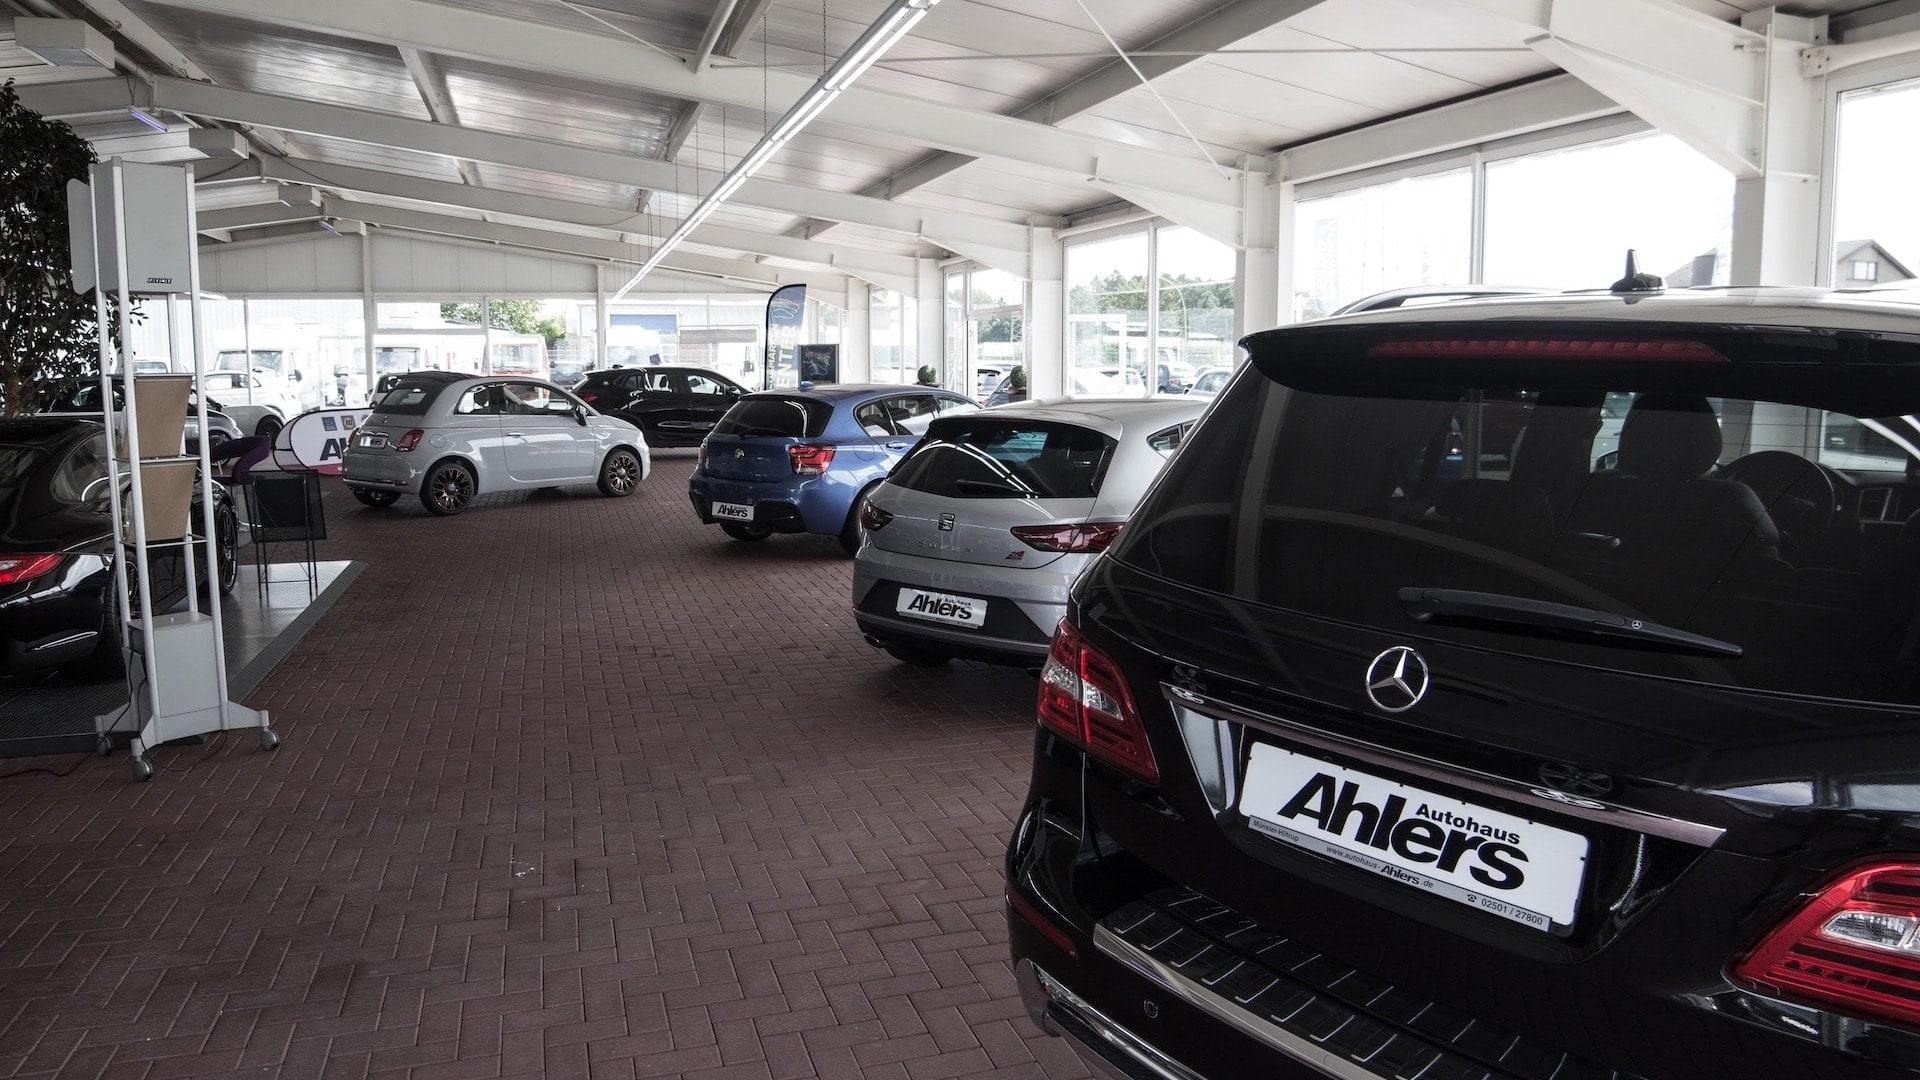 Autohaus Ahlers Fuhrpark Innen